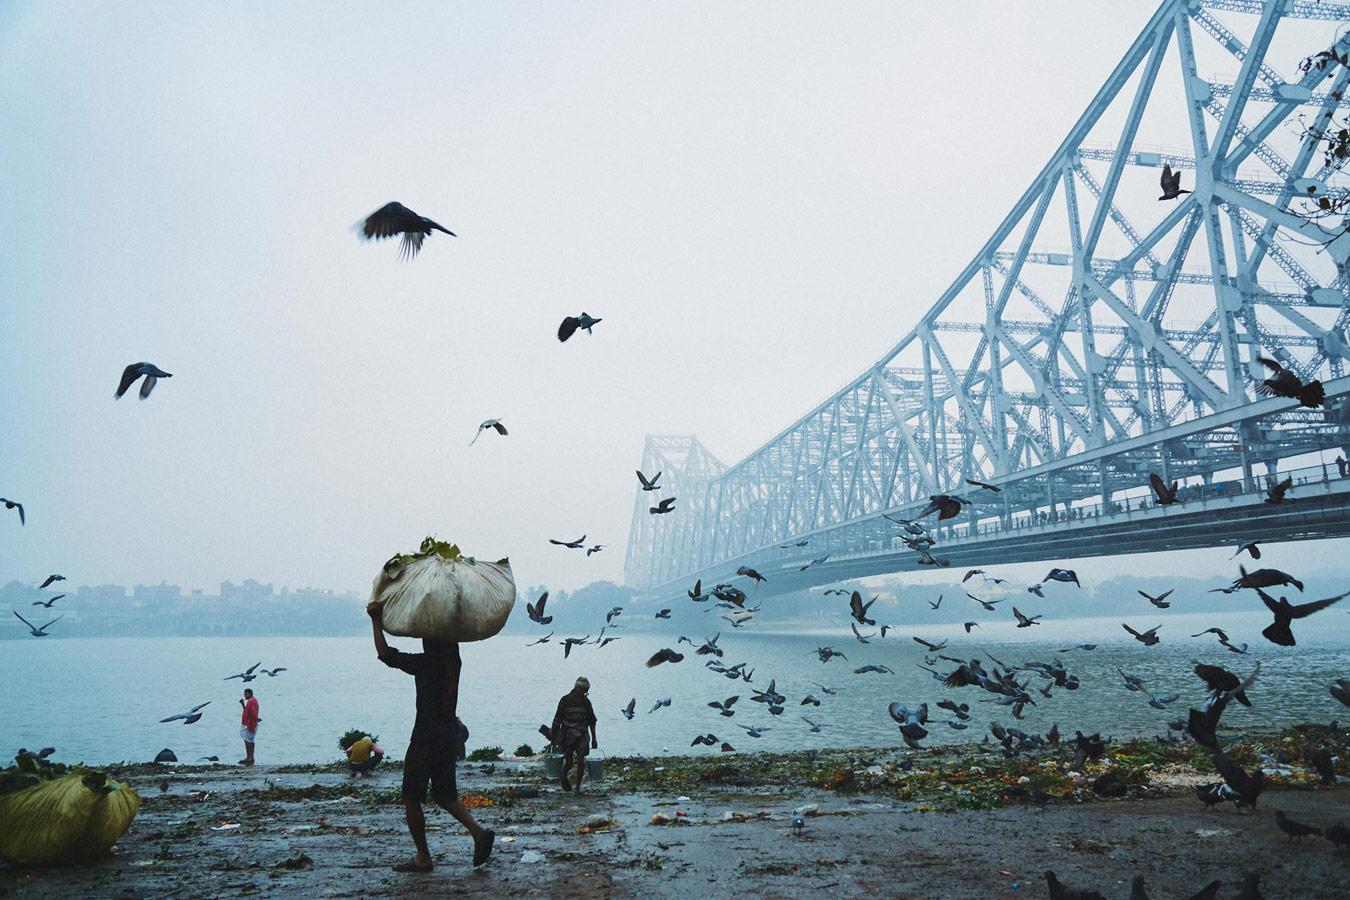 Мохаммад Амир Хамжа, Бангладеш / Mohammad Amir Hamja, Bangladesh, Национальная премия, Фотоконкурс Sony World Photography Awards 2017